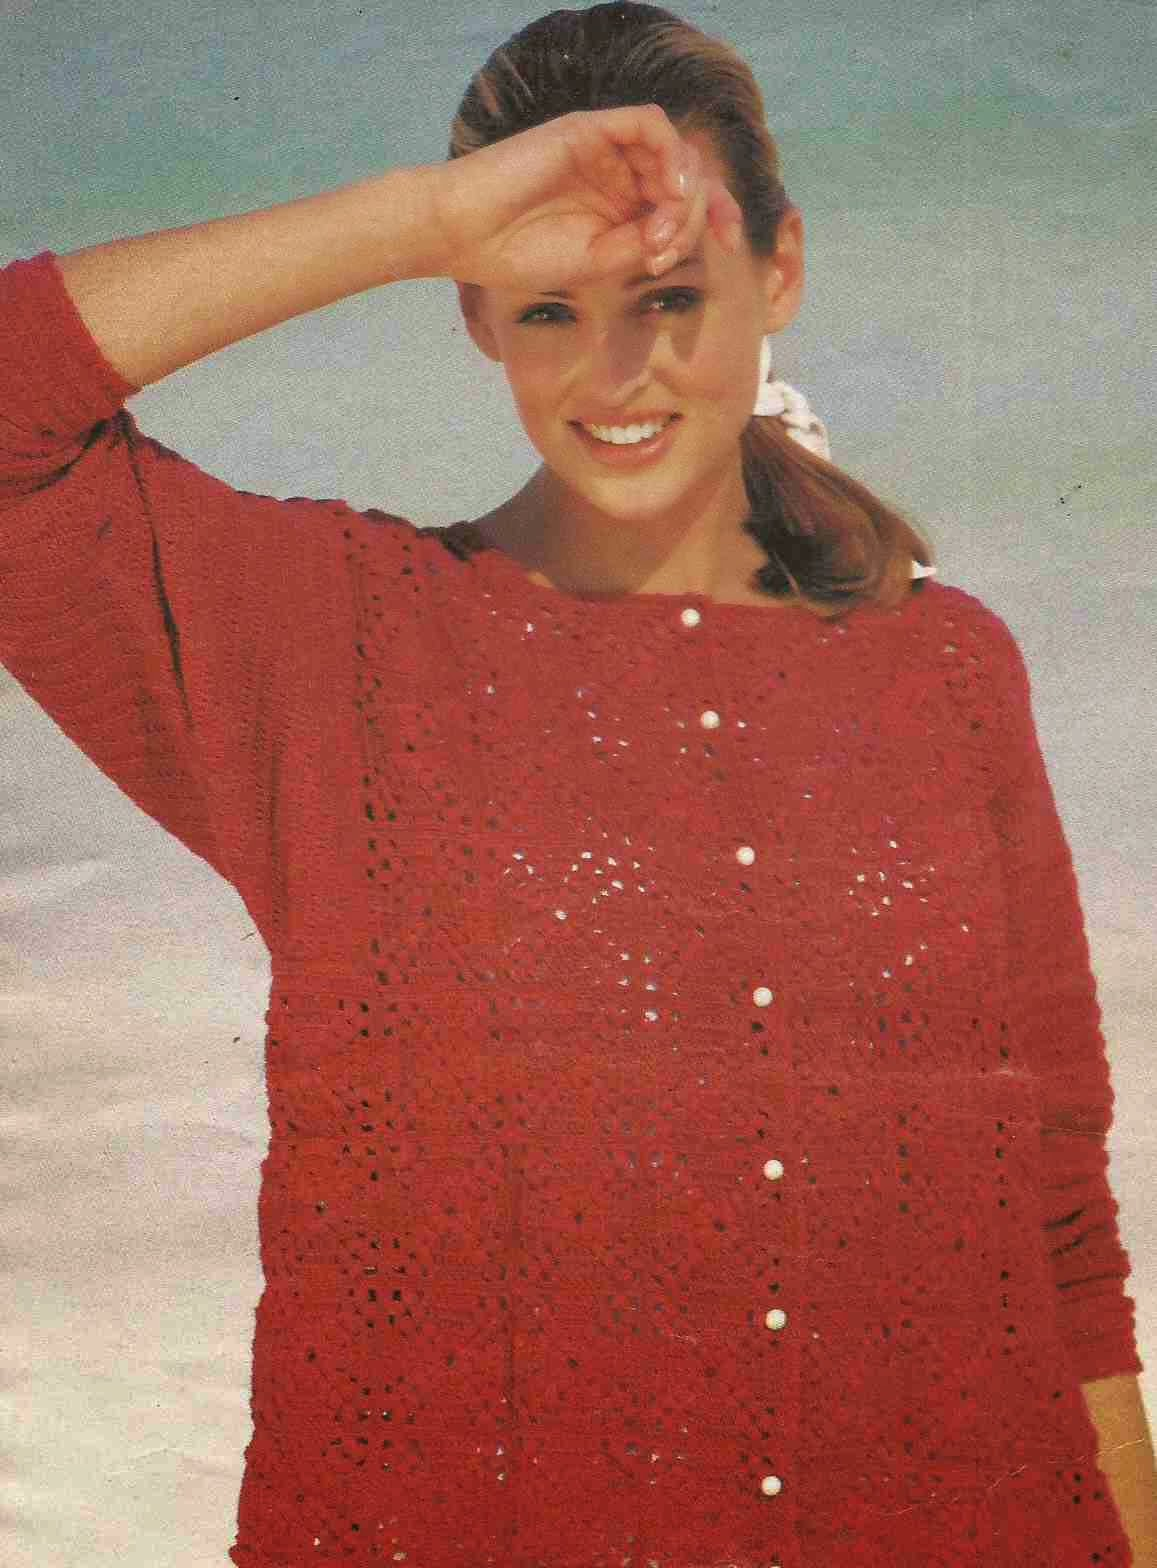 #118 Chaqueta Roja a Crochet o Ganchillo